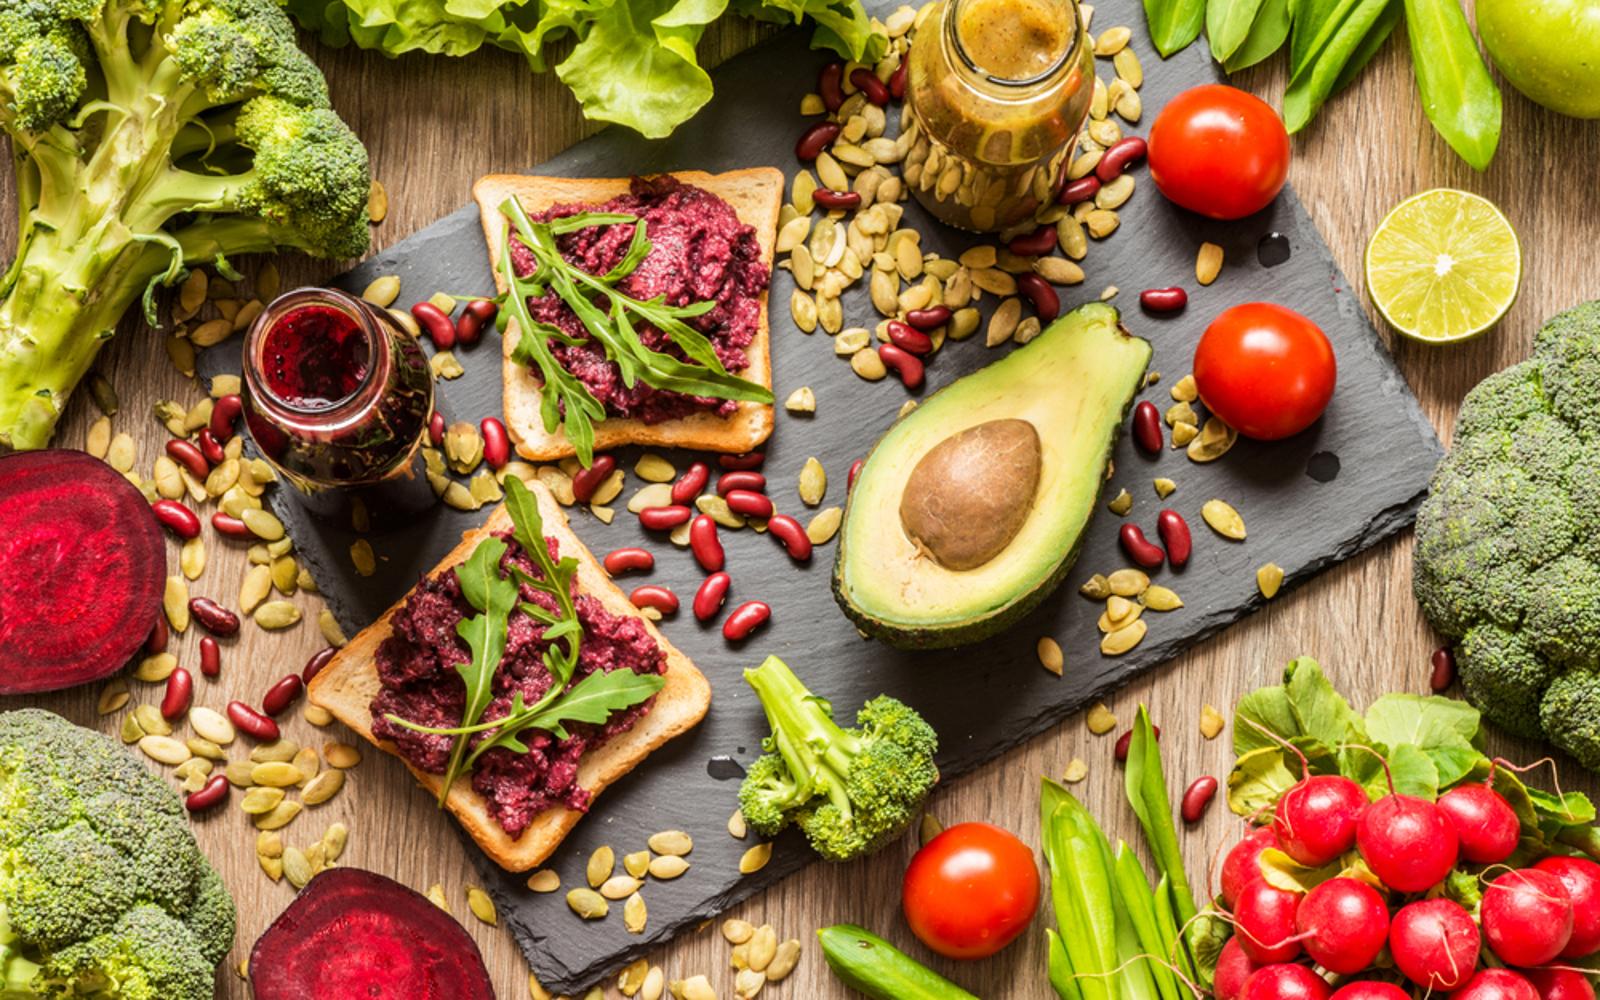 Vegan food avocado sandwiches with beet hummus